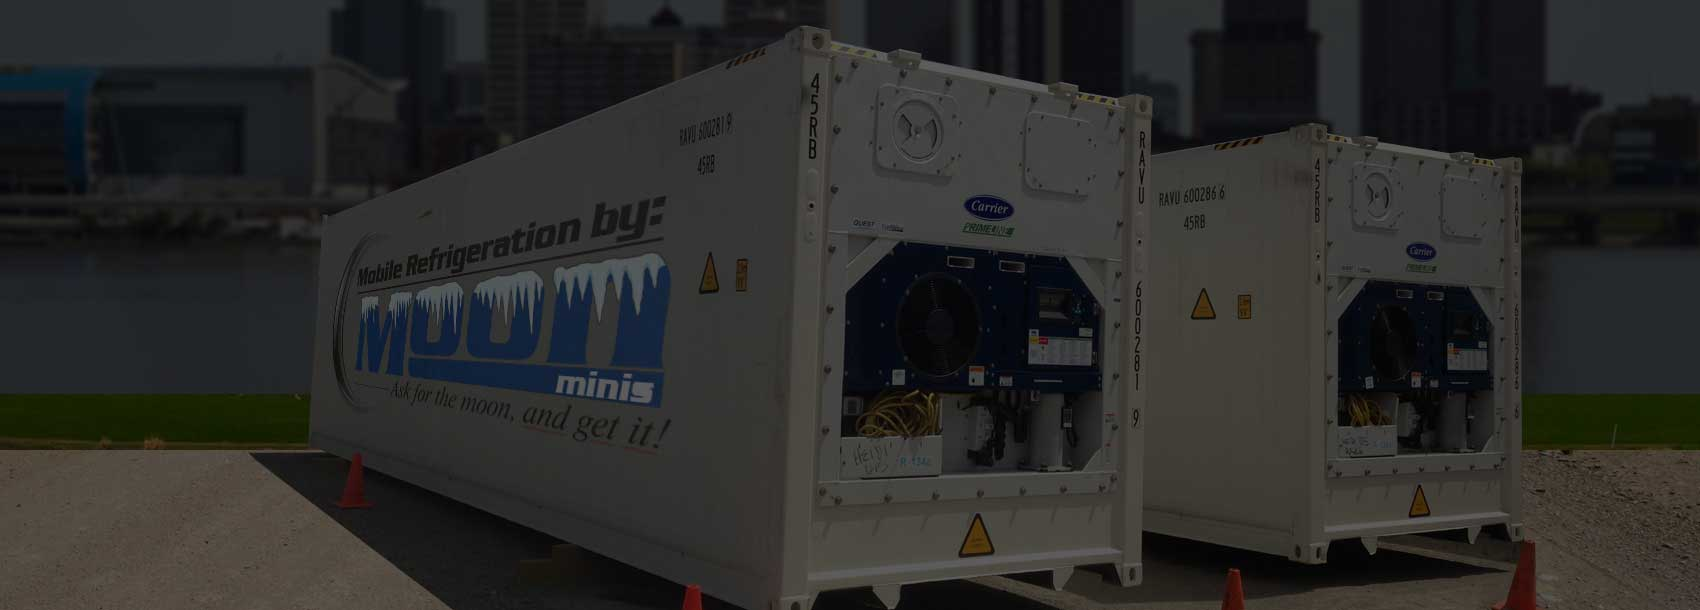 Portable Refrigeration Moon Companies